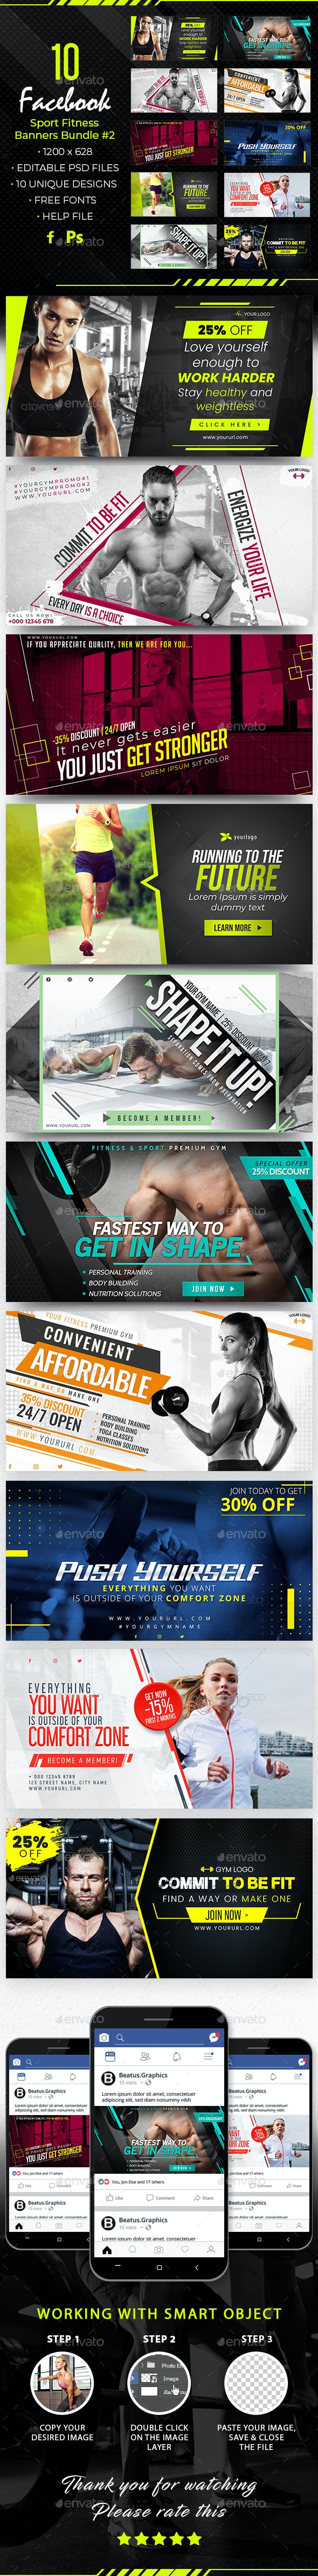 Facebook Sport Fitness Banners Bundle - Web Elements